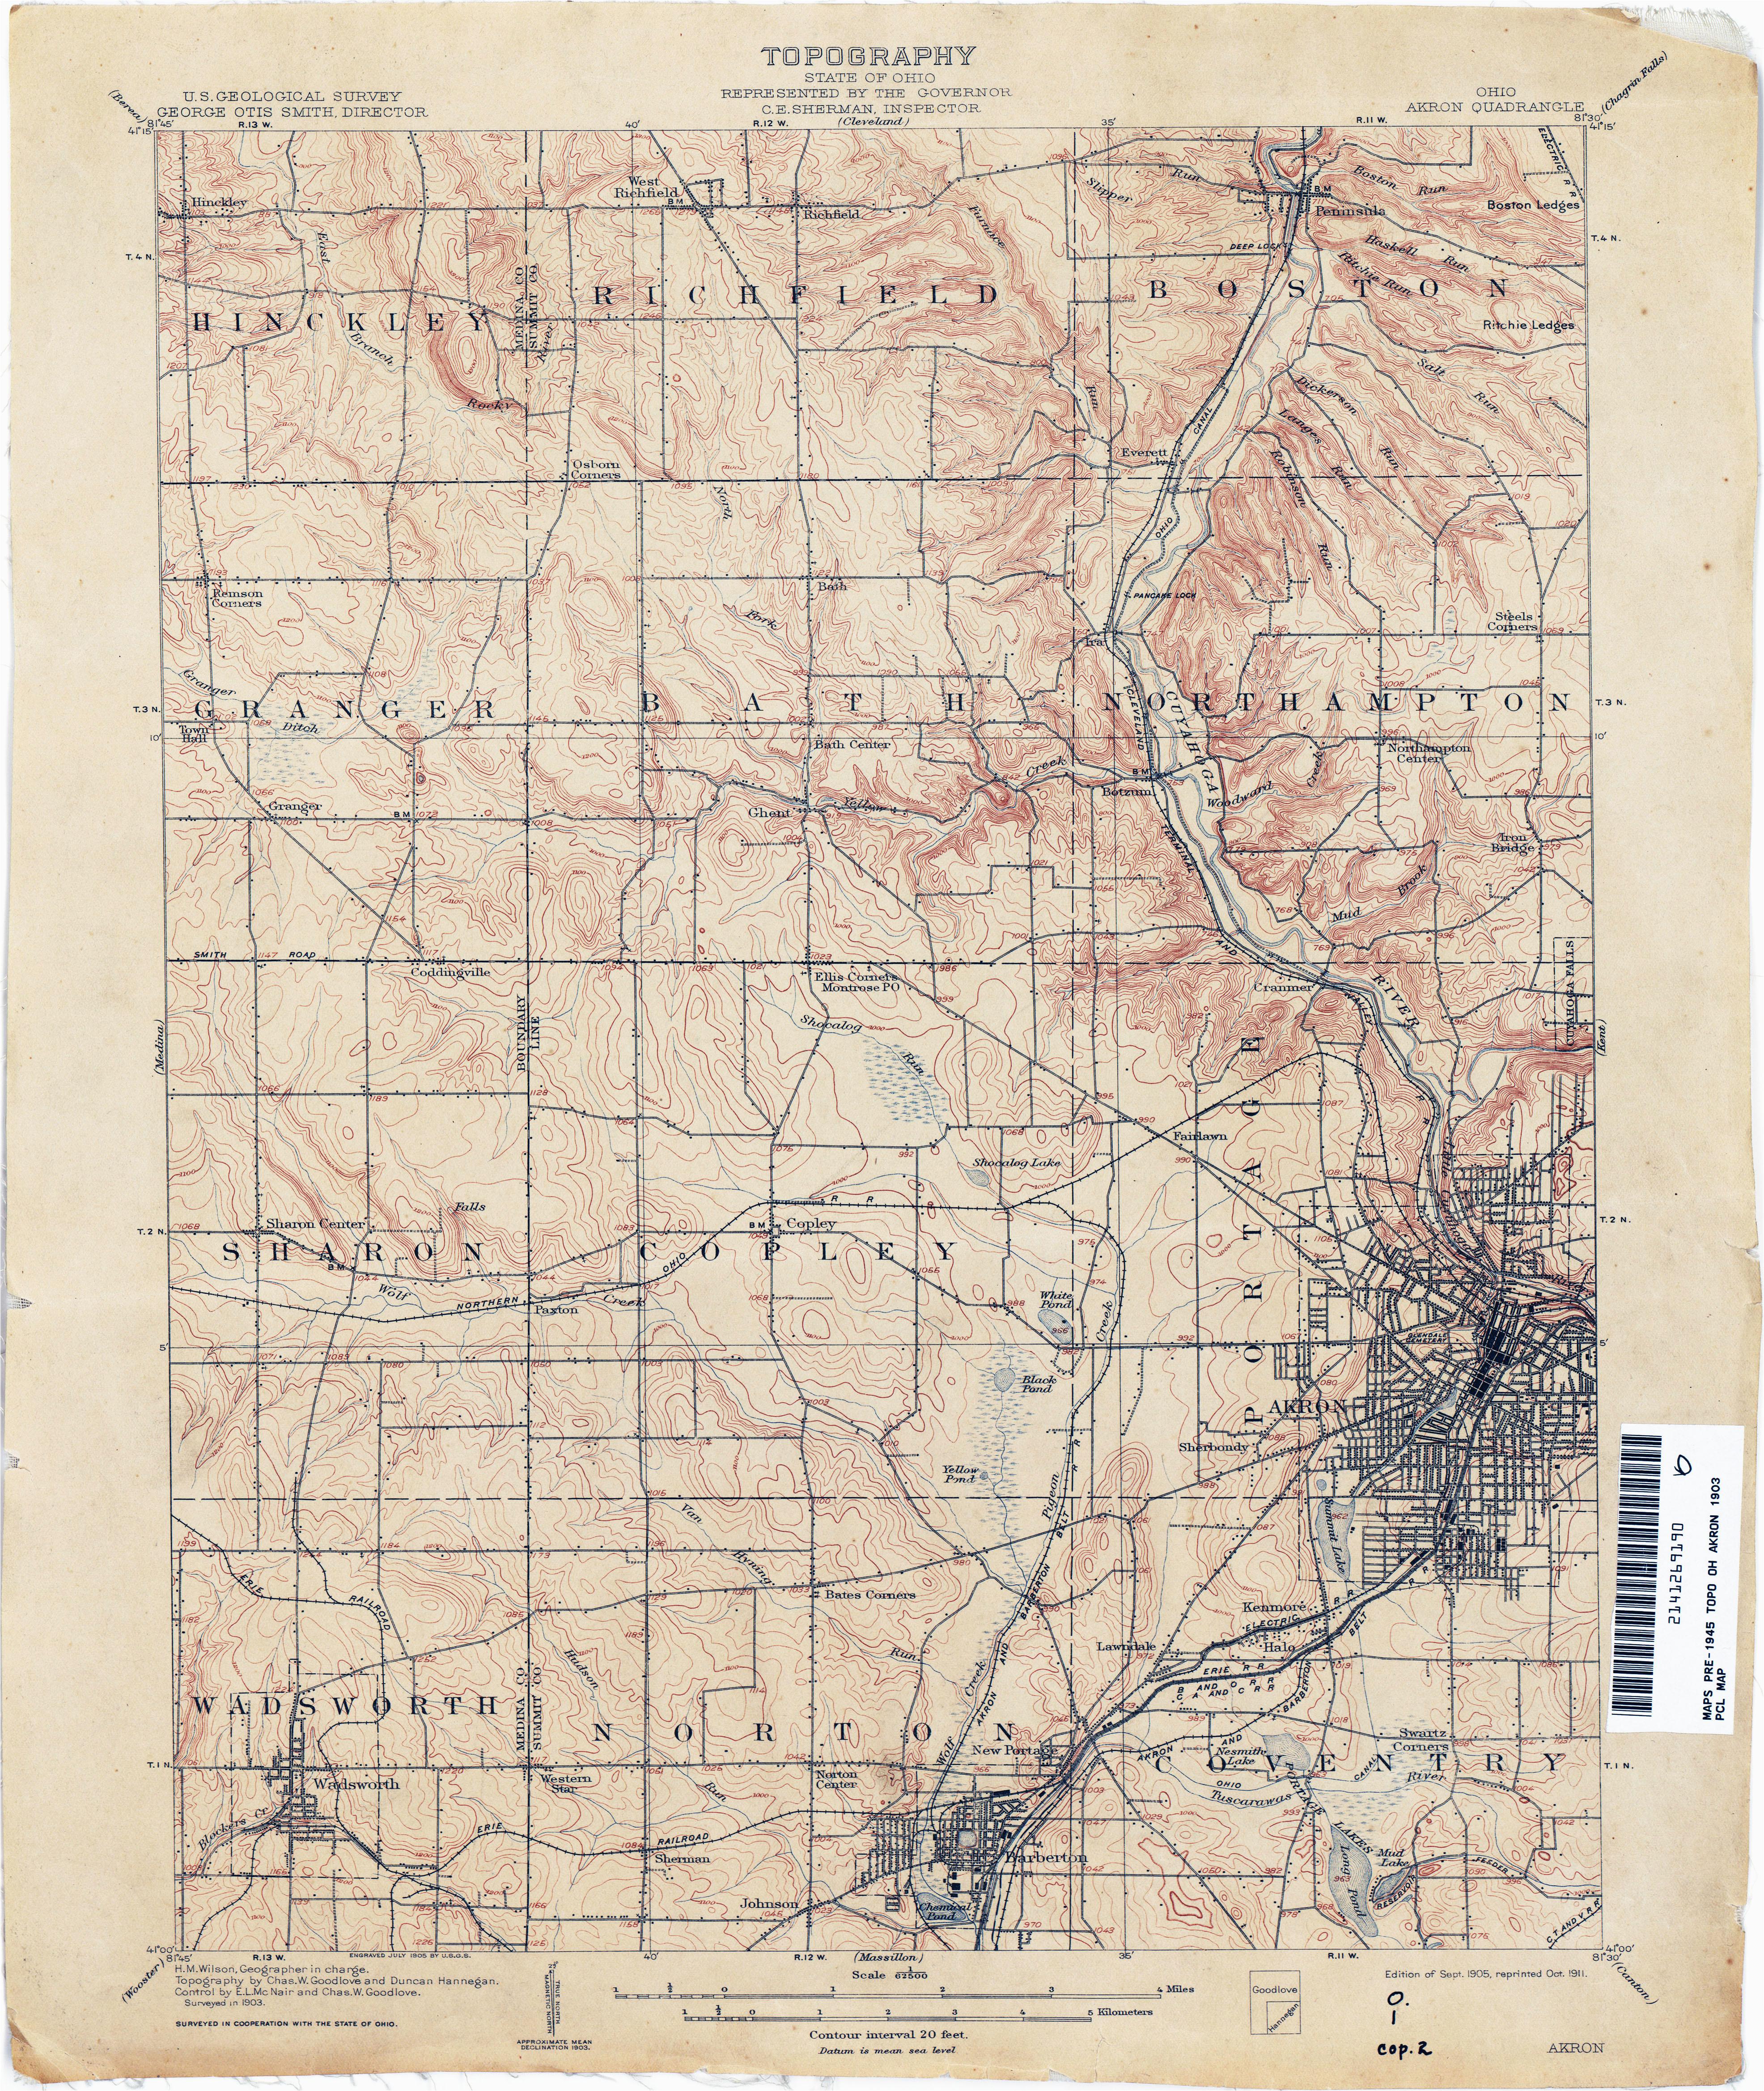 Alexandria Ohio Map Ohio Historical topographic Maps Perry Castaa Eda Map Collection